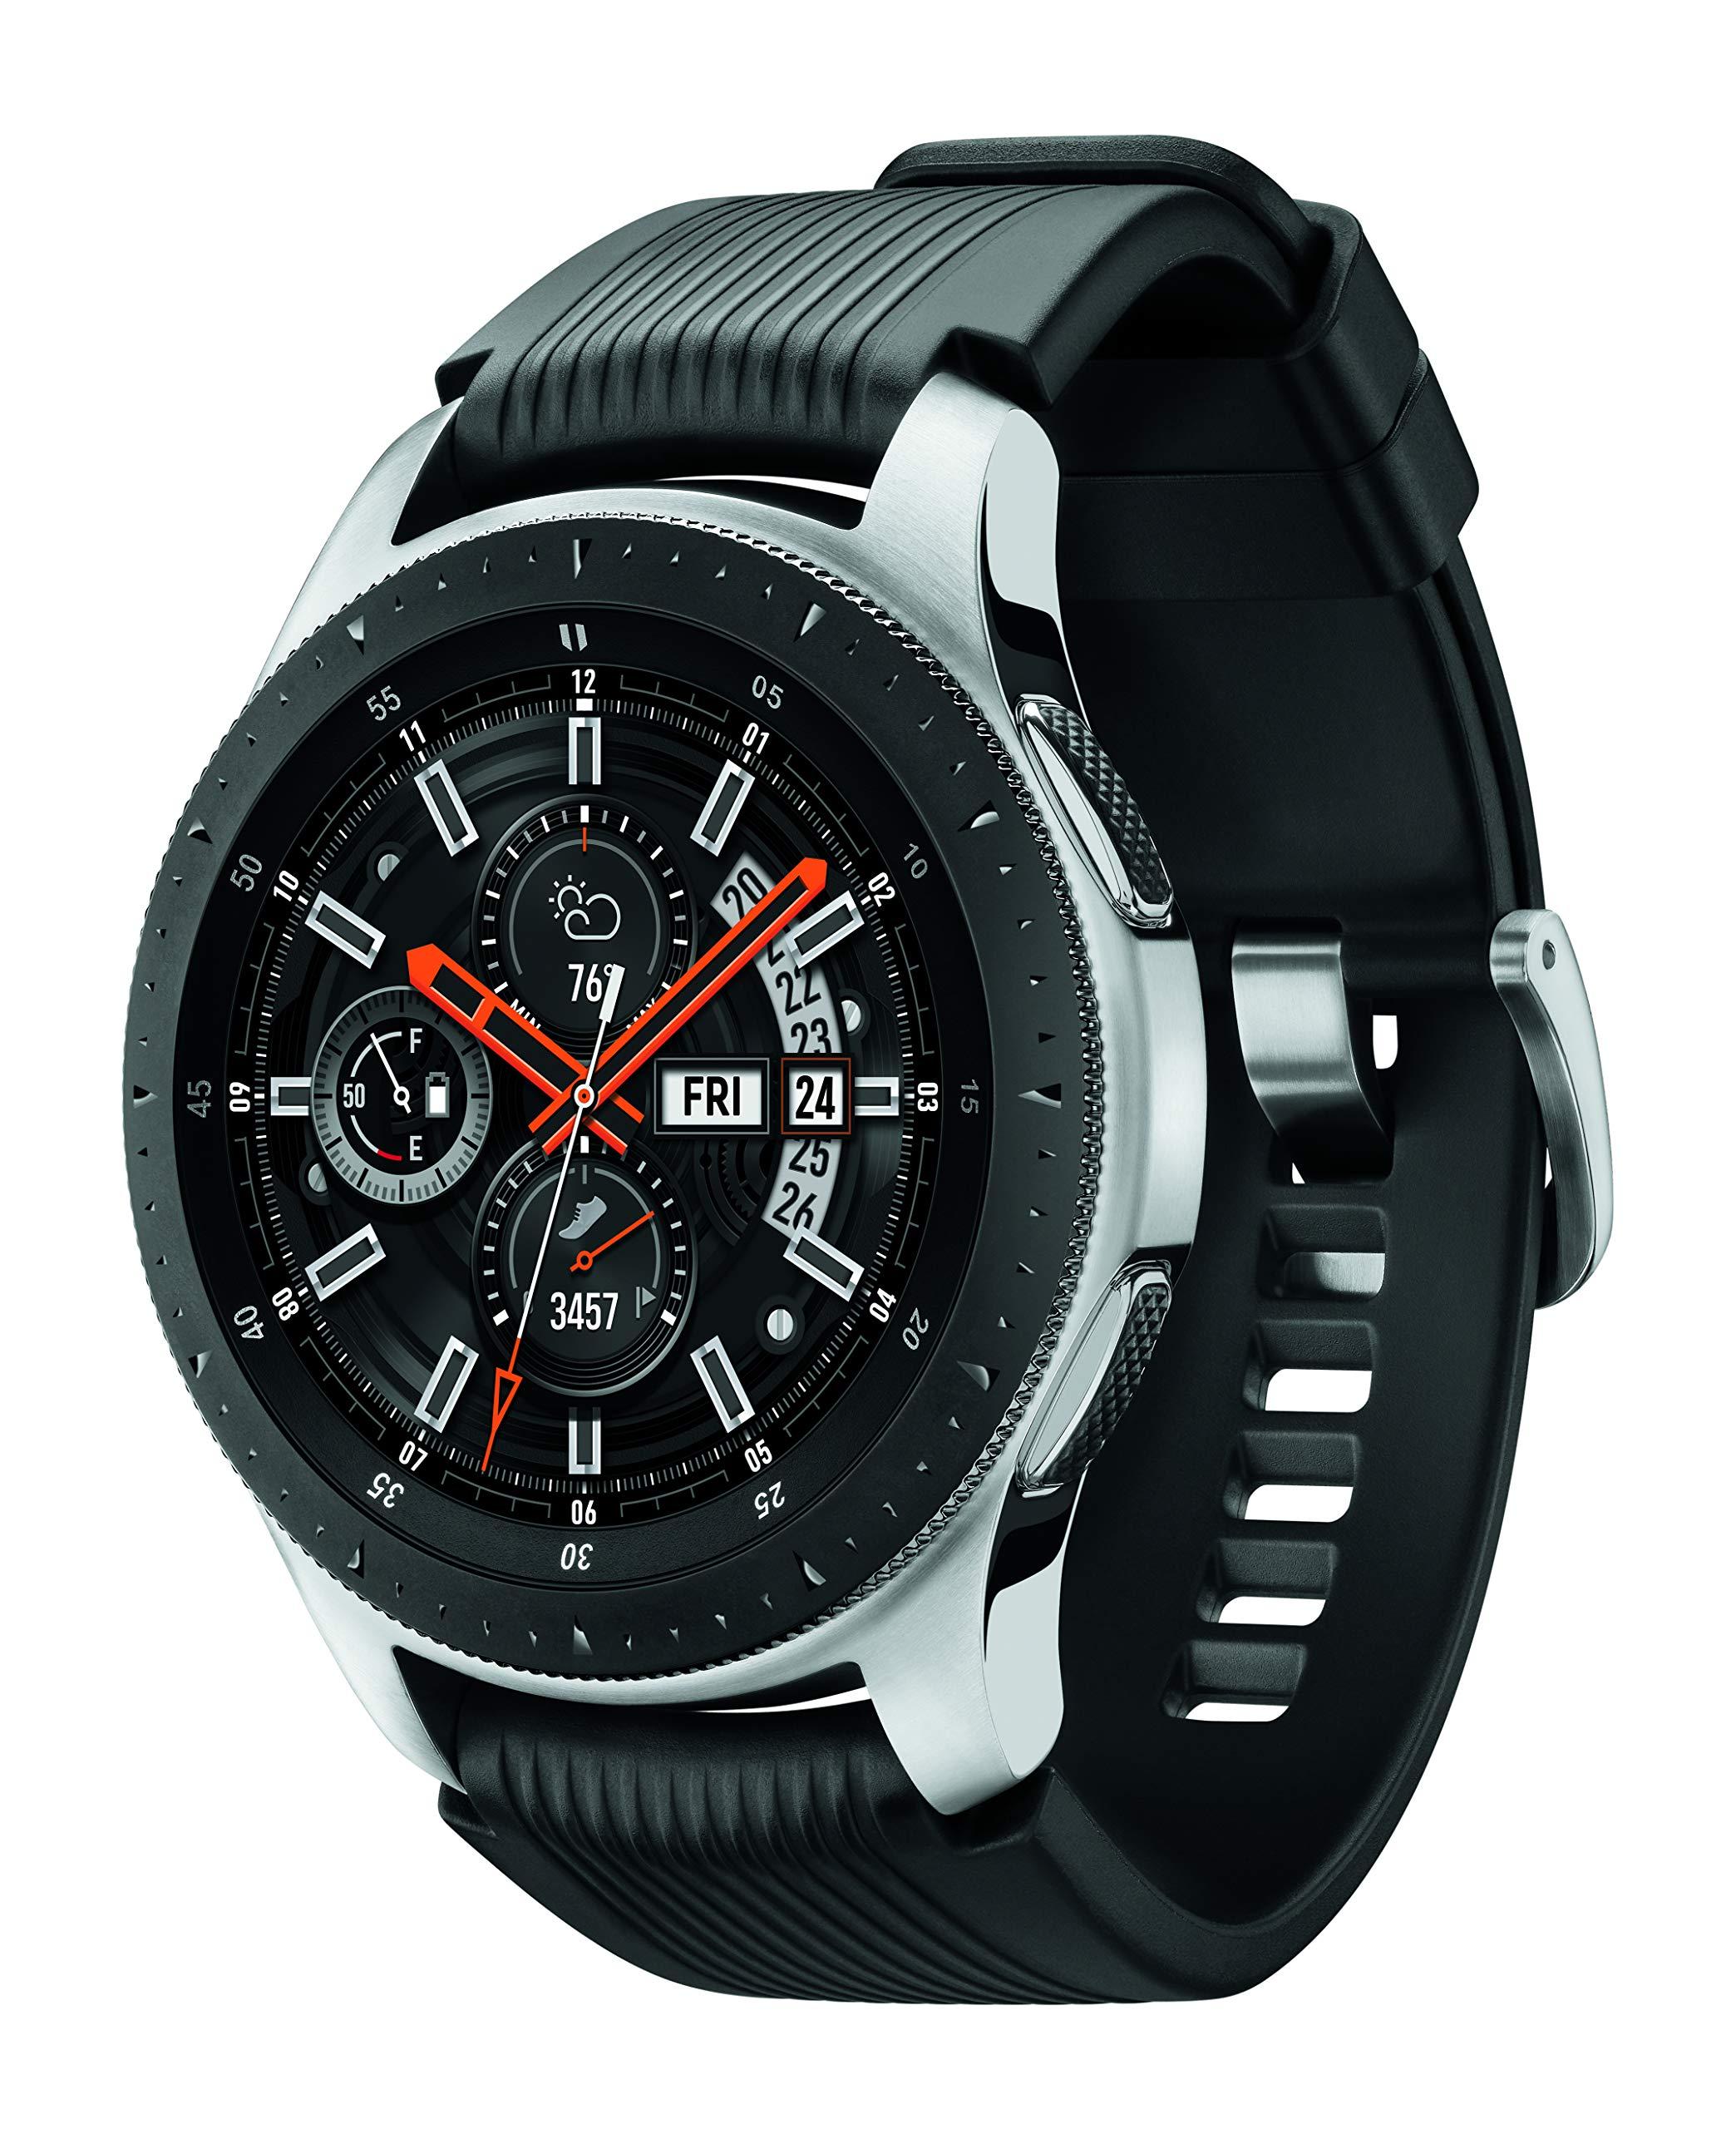 Samsung Galaxy Smartwatch (46mm) Silver (Bluetooth), SM-R800NZSAXAR - US Version with Warranty by Samsung (Image #2)